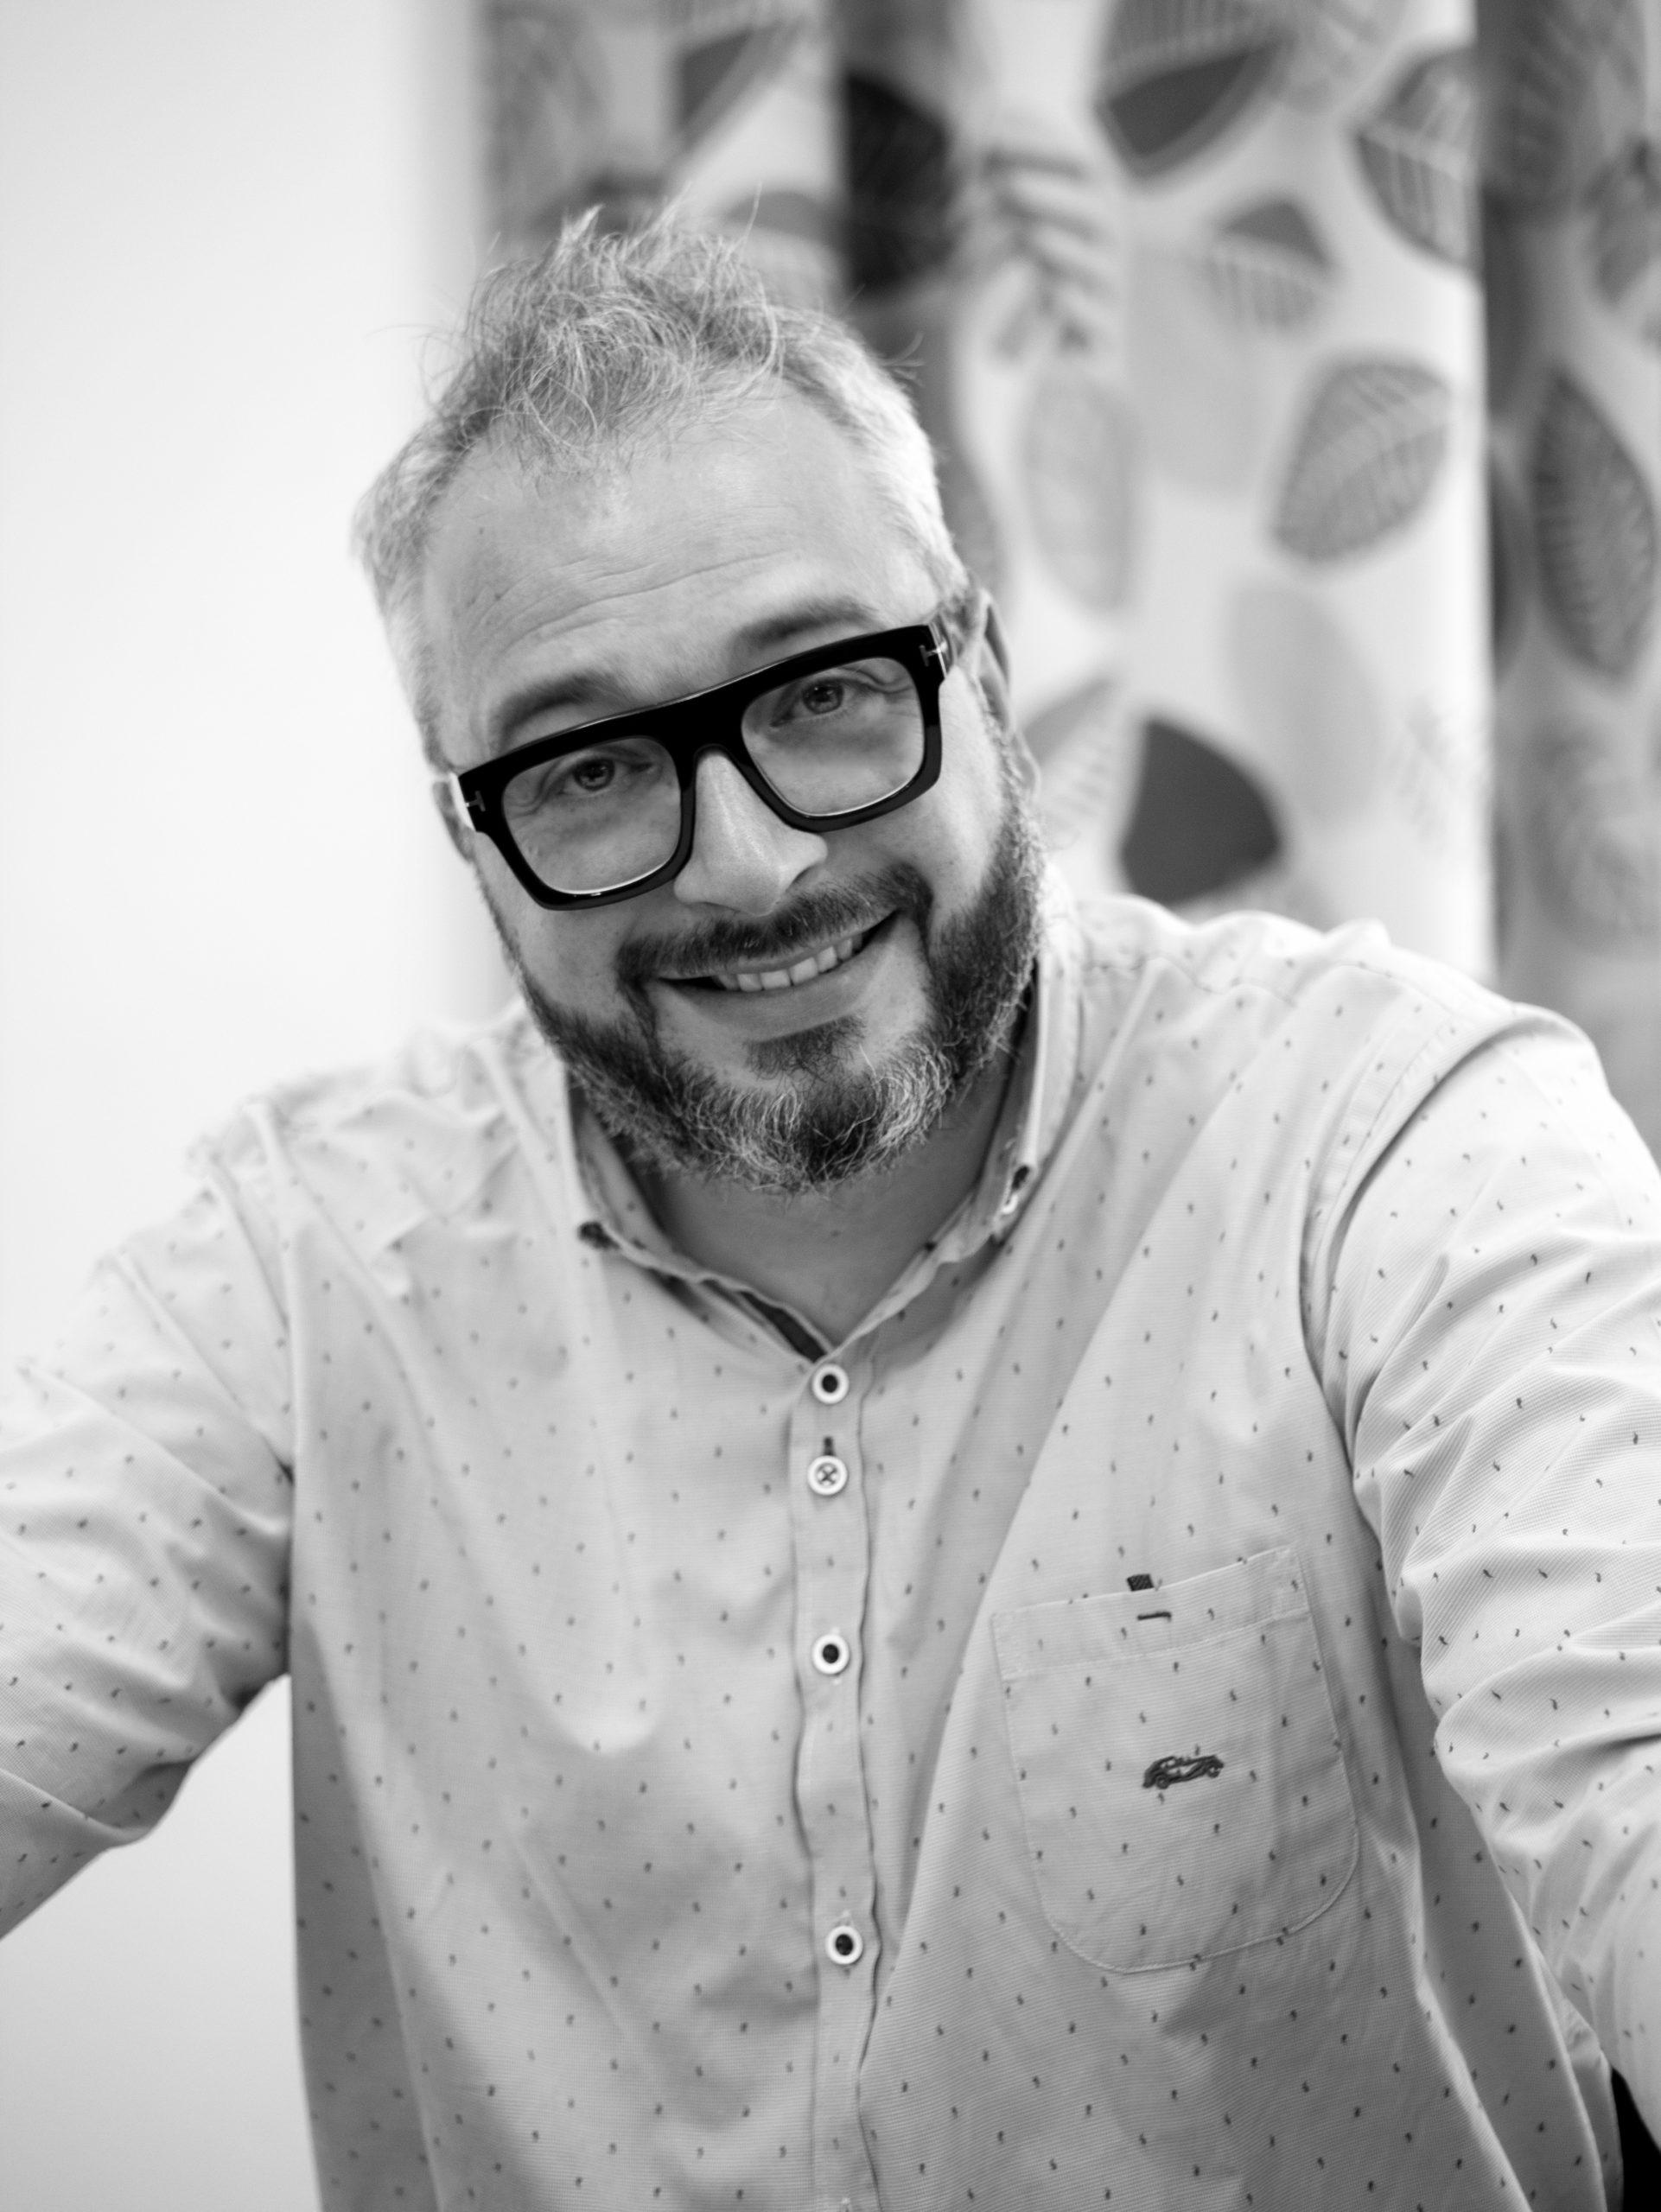 https://www.soredis.fr/wp-content/uploads/2020/07/ThomasDandreau-Valencienne-scaled.jpg